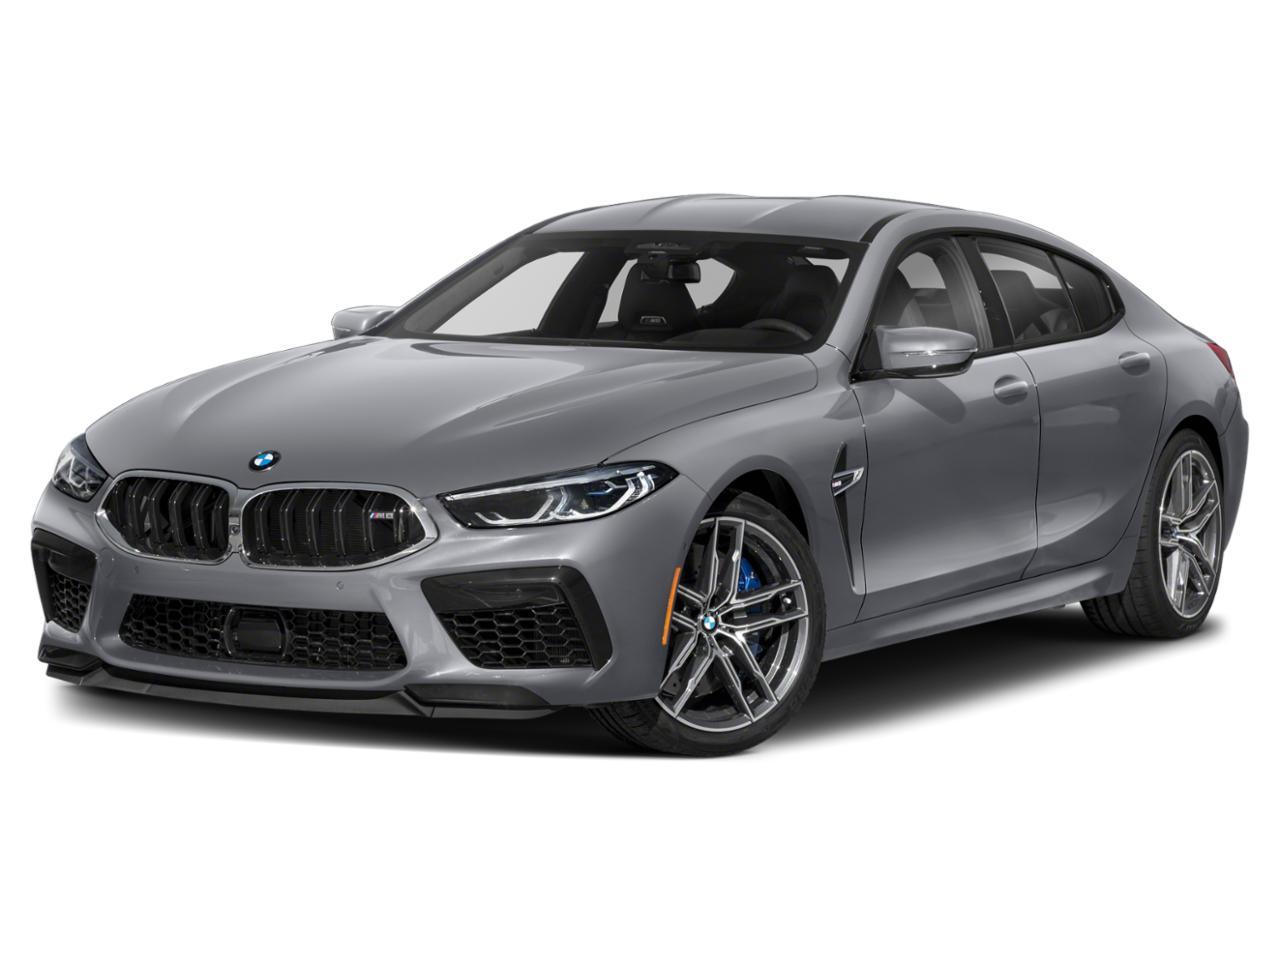 2022 BMW M8 Vehicle Photo in Grapevine, TX 76051